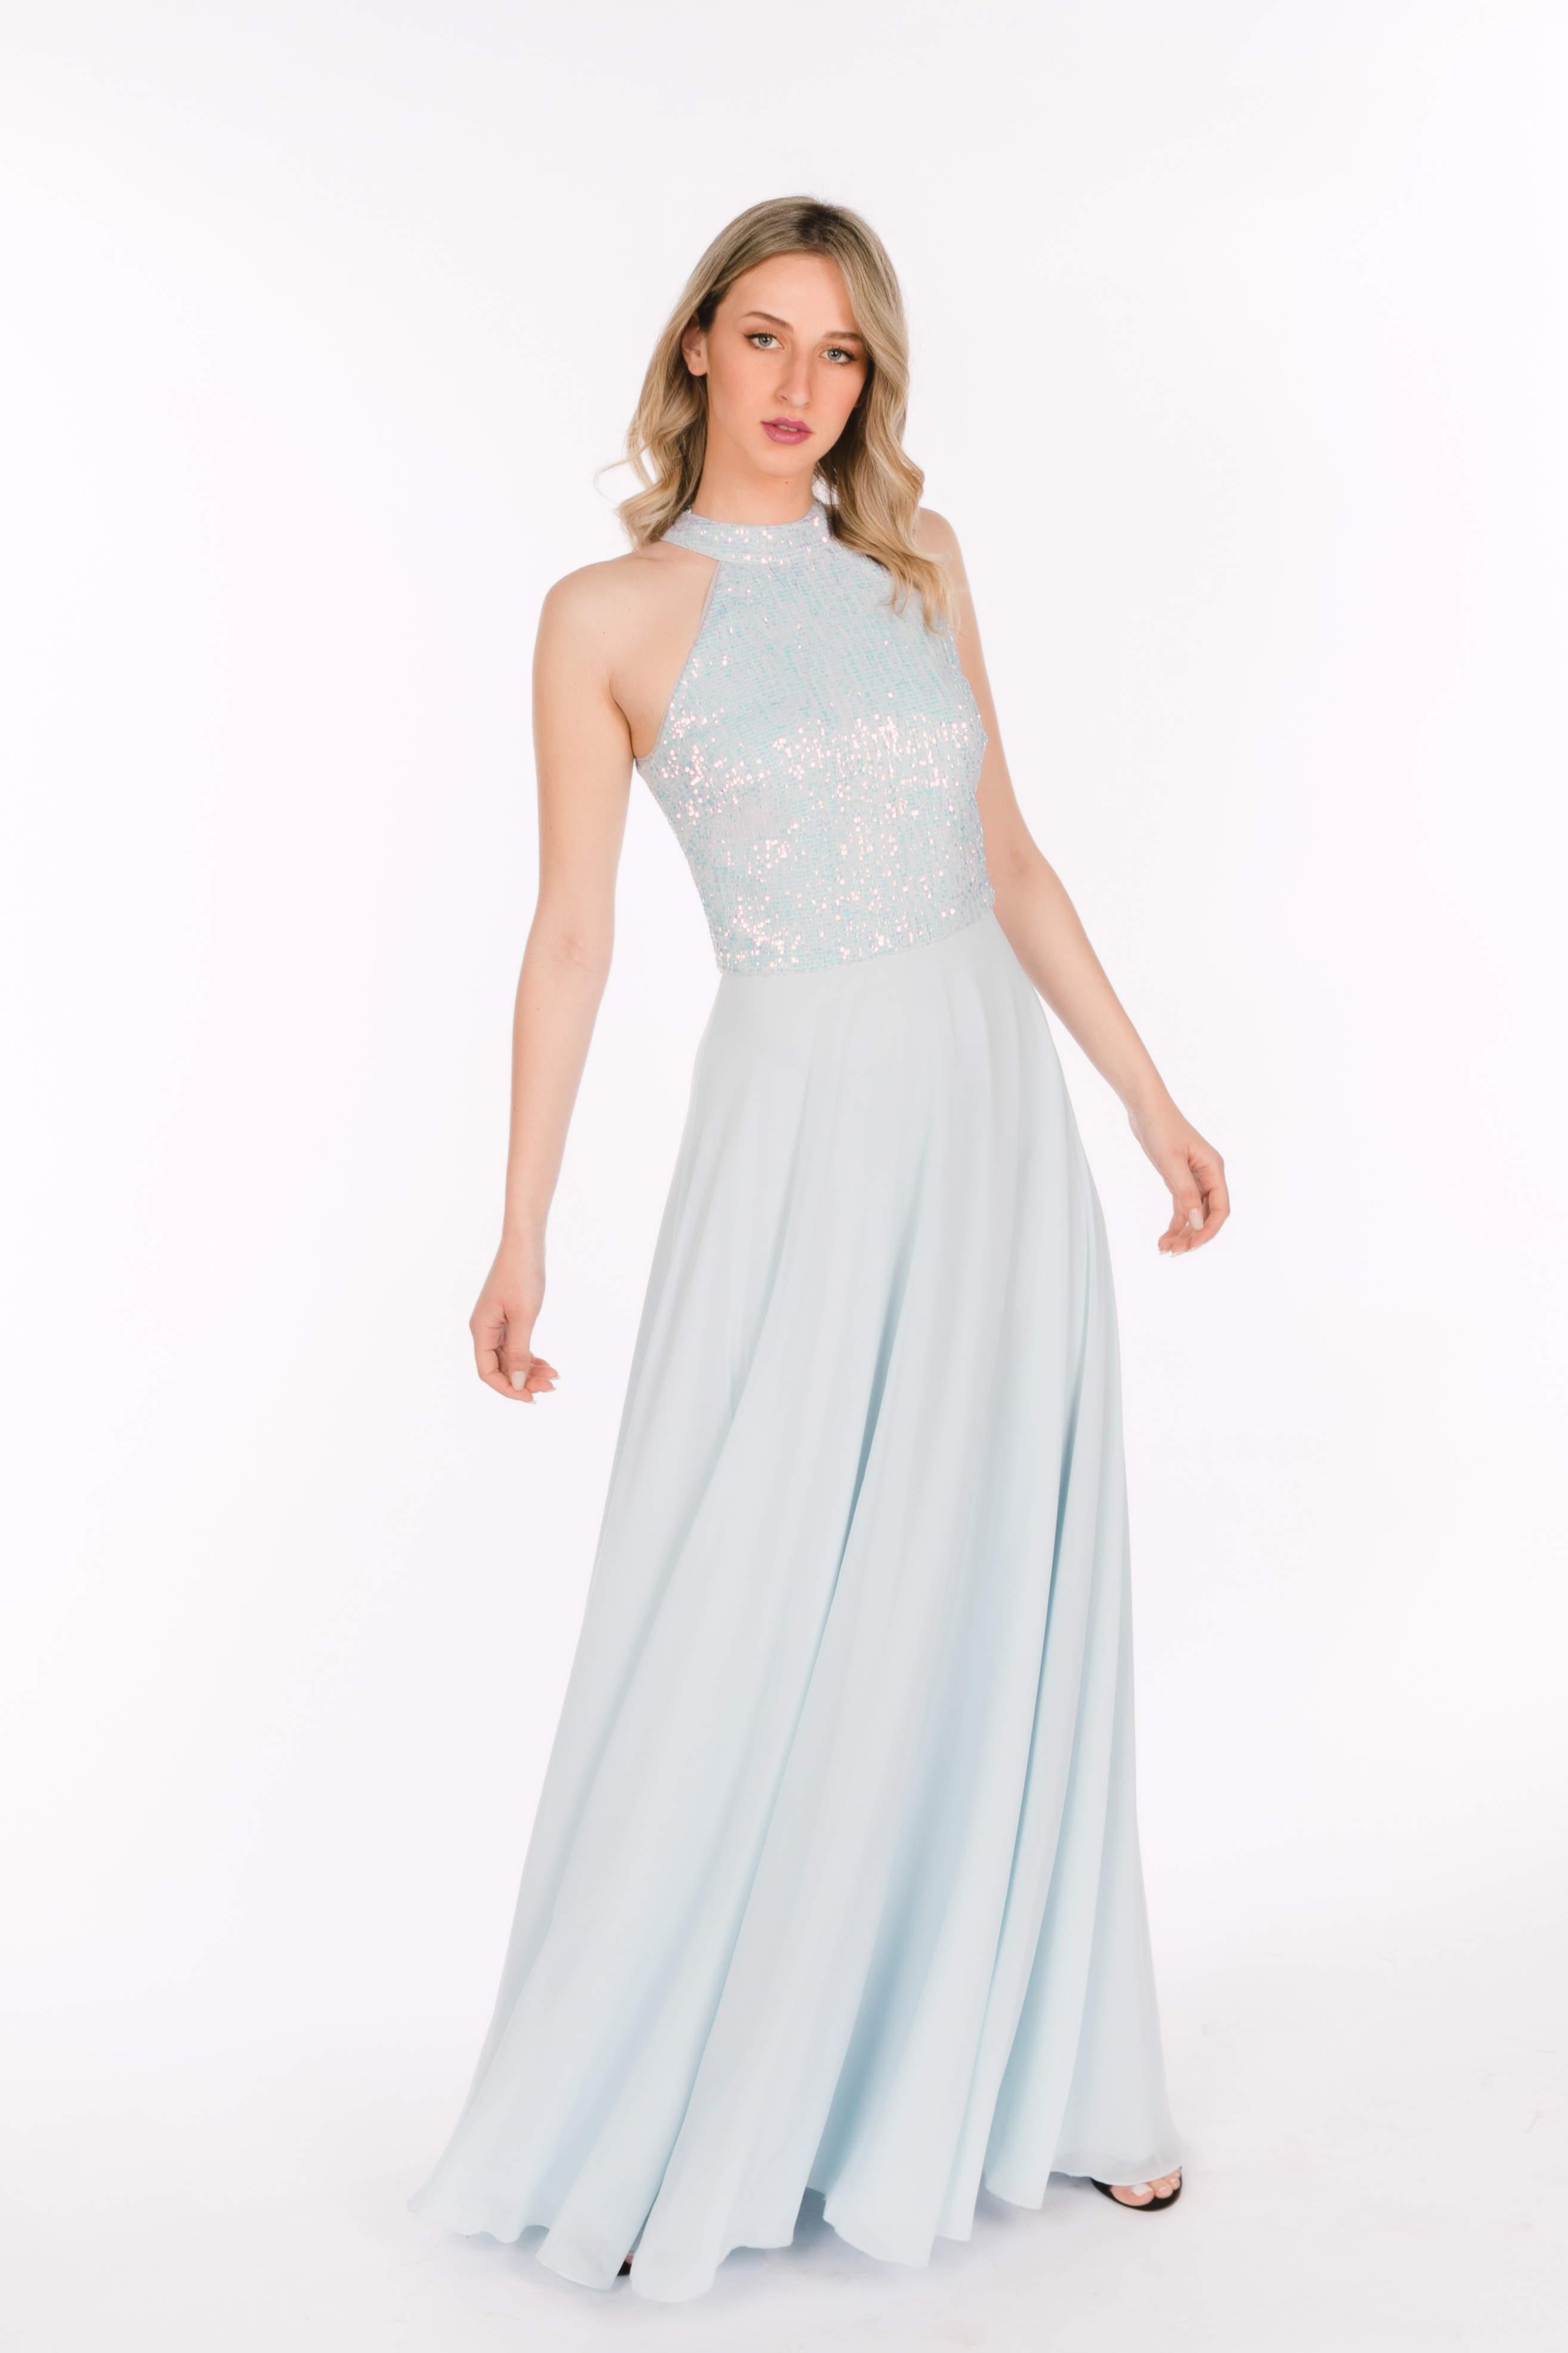 17080318b507 02.171 Αέρινο κοκέιλ φόρεμα με μπούστο απο παγέτα και φούστα απο μουσελίνα